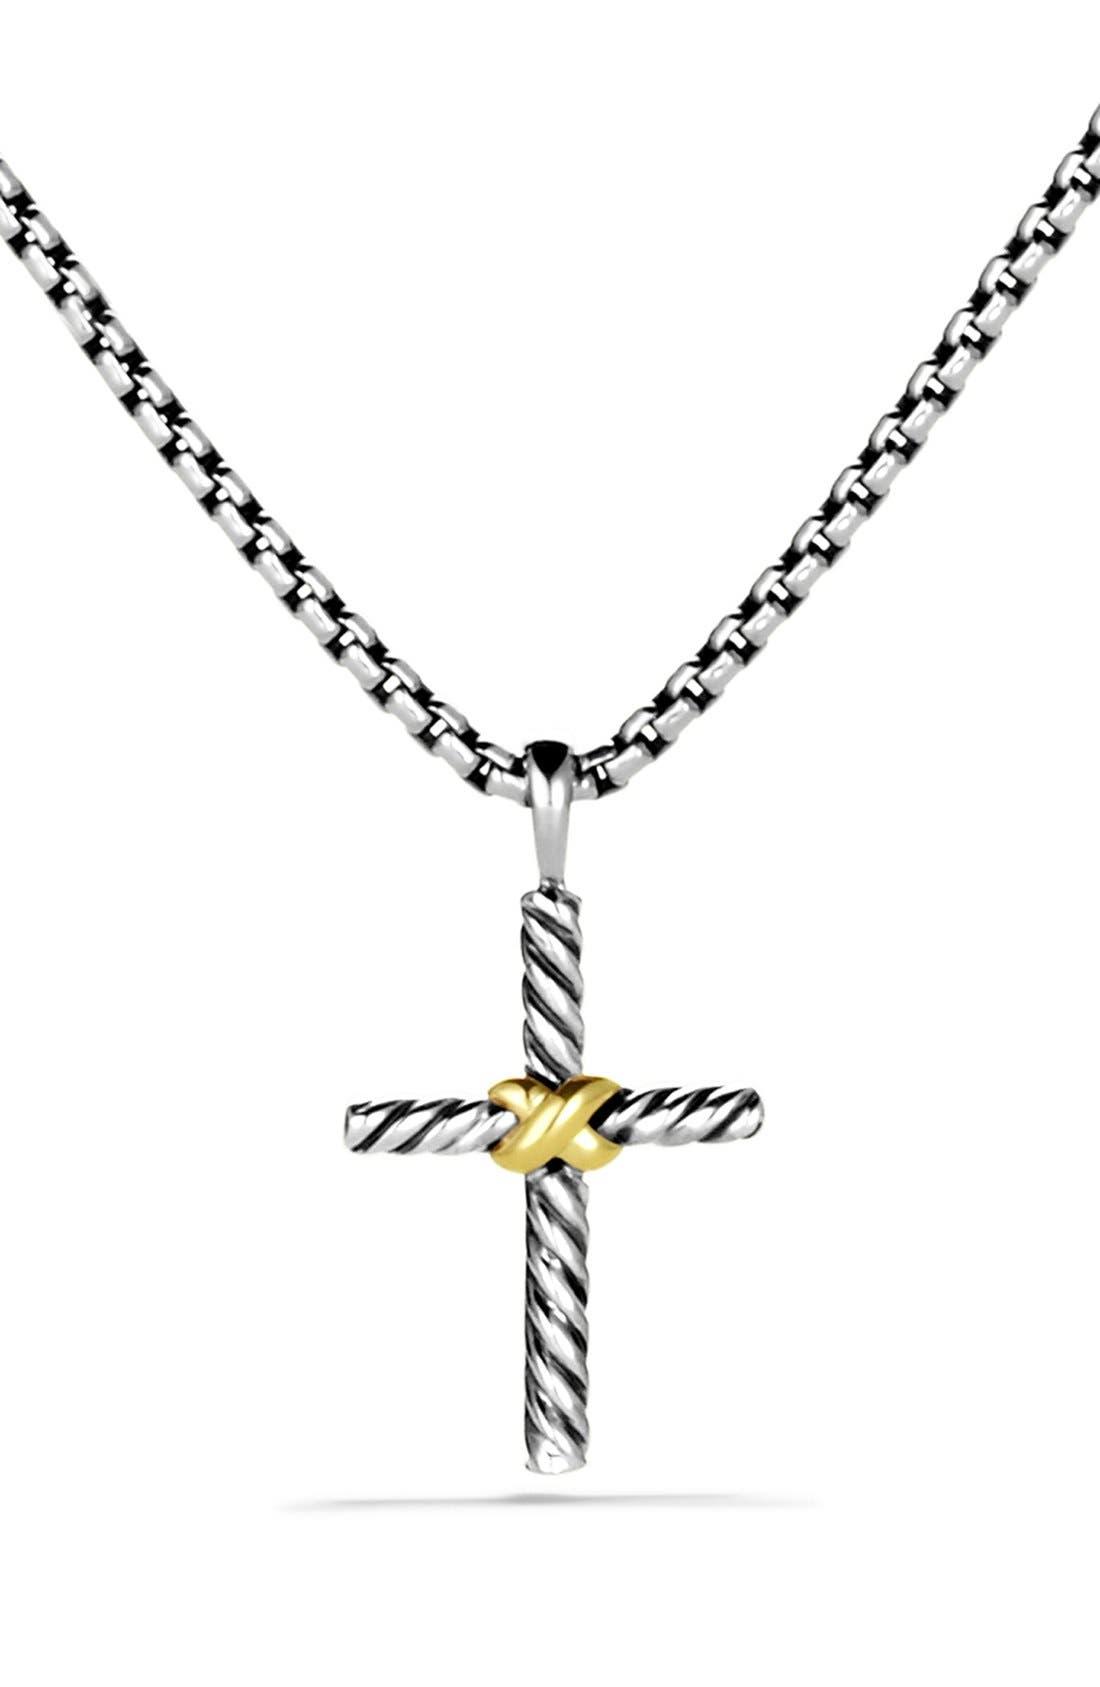 David Yurman 'X' Cross with Gold on Chain